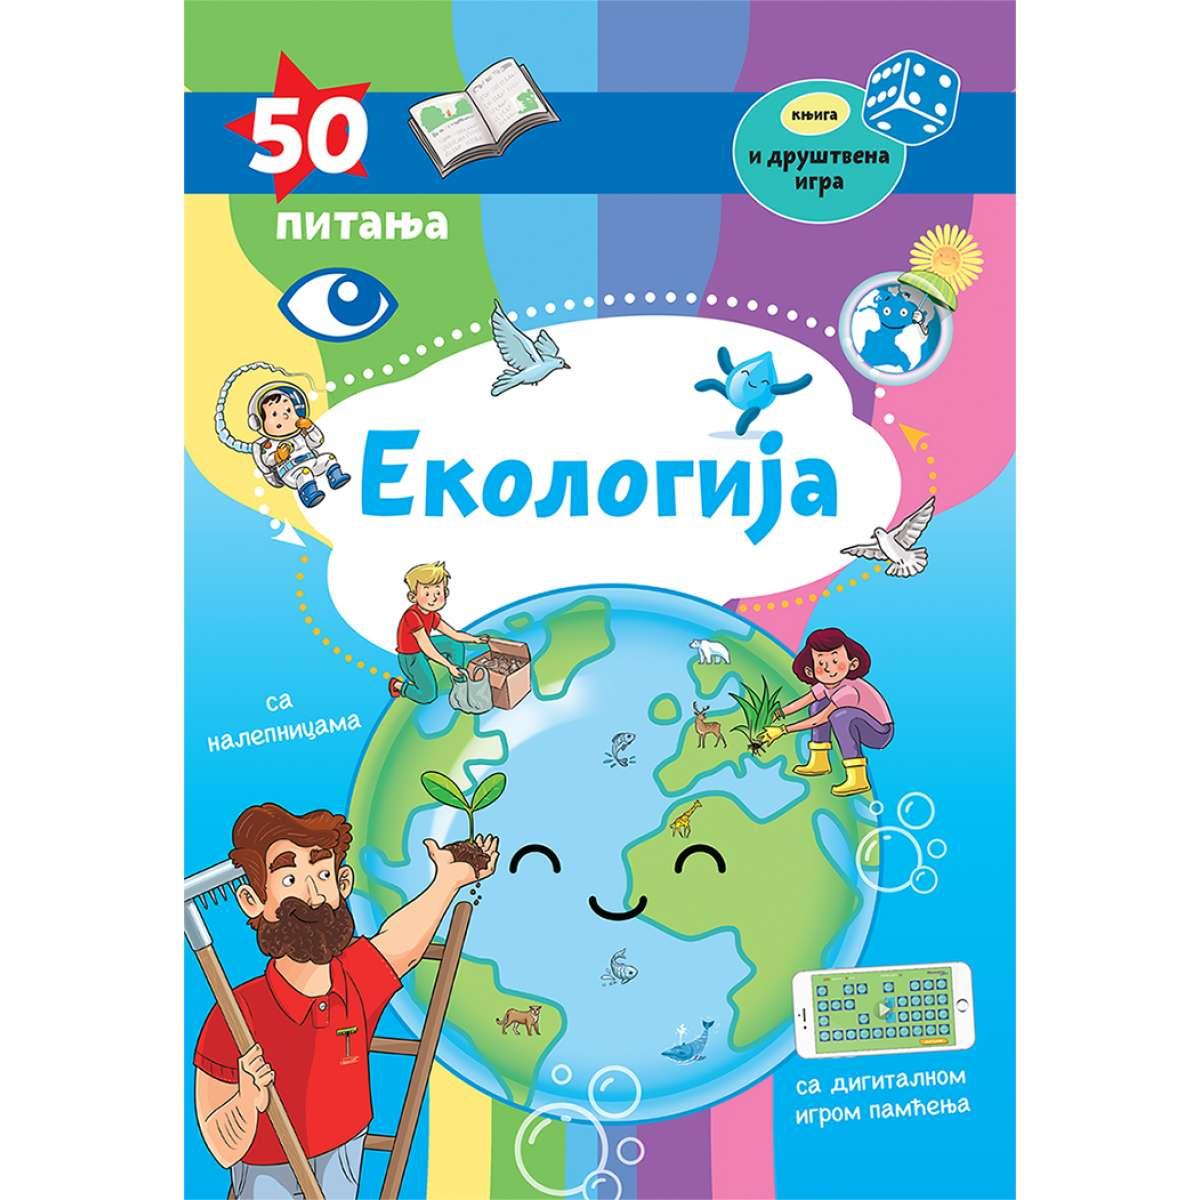 50 PITANJA – EKOLOGIJA